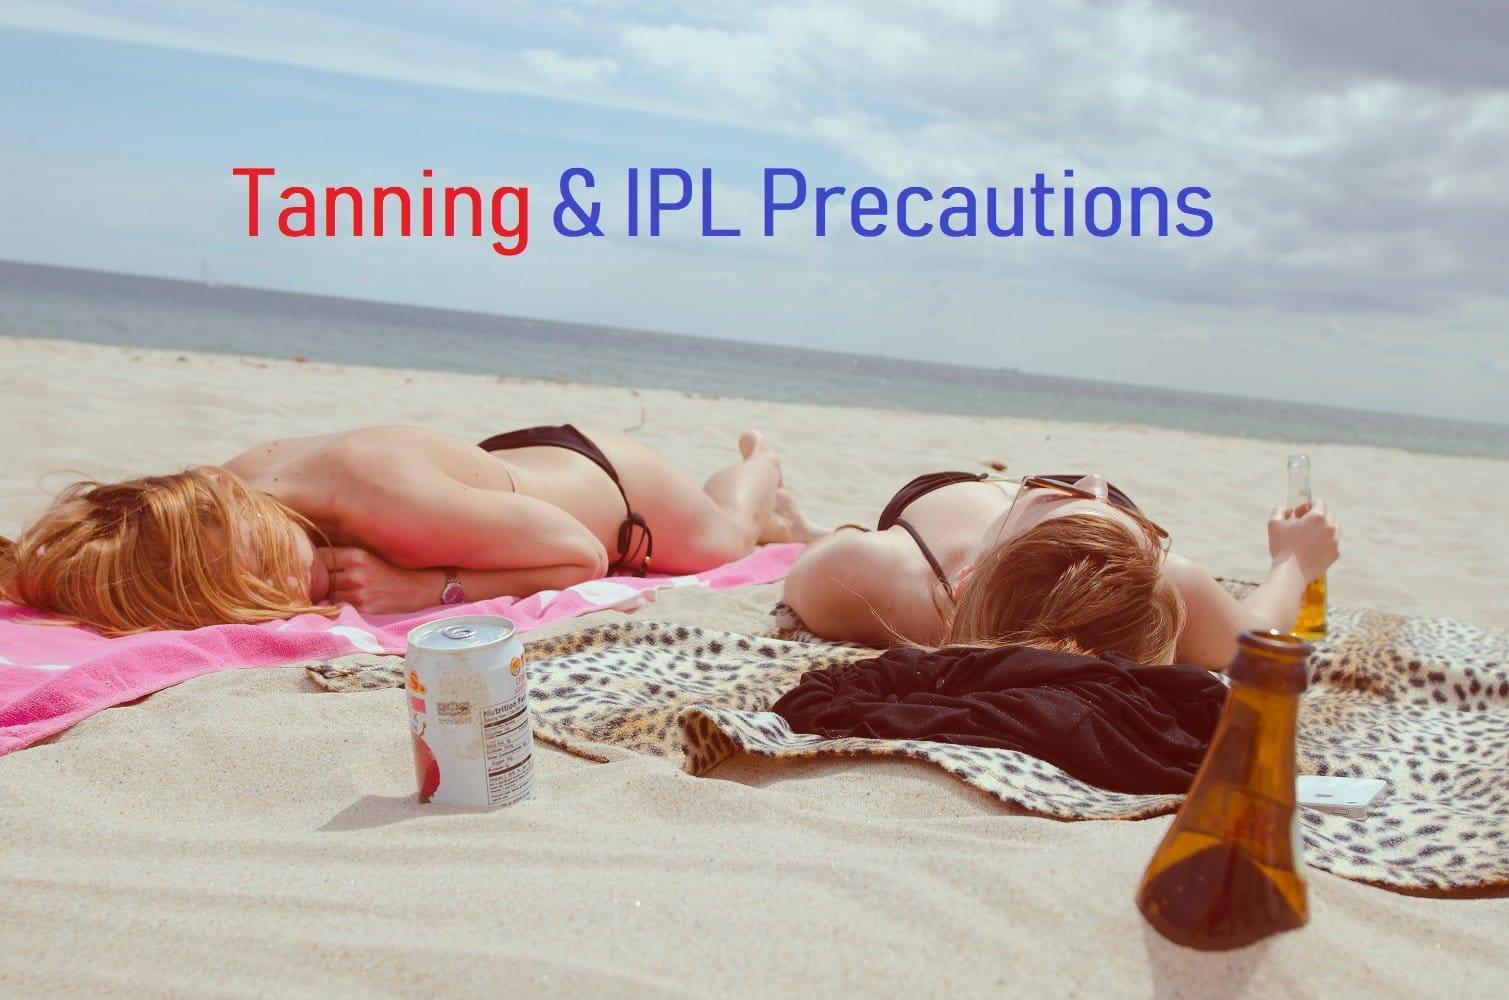 Tanning & IPL